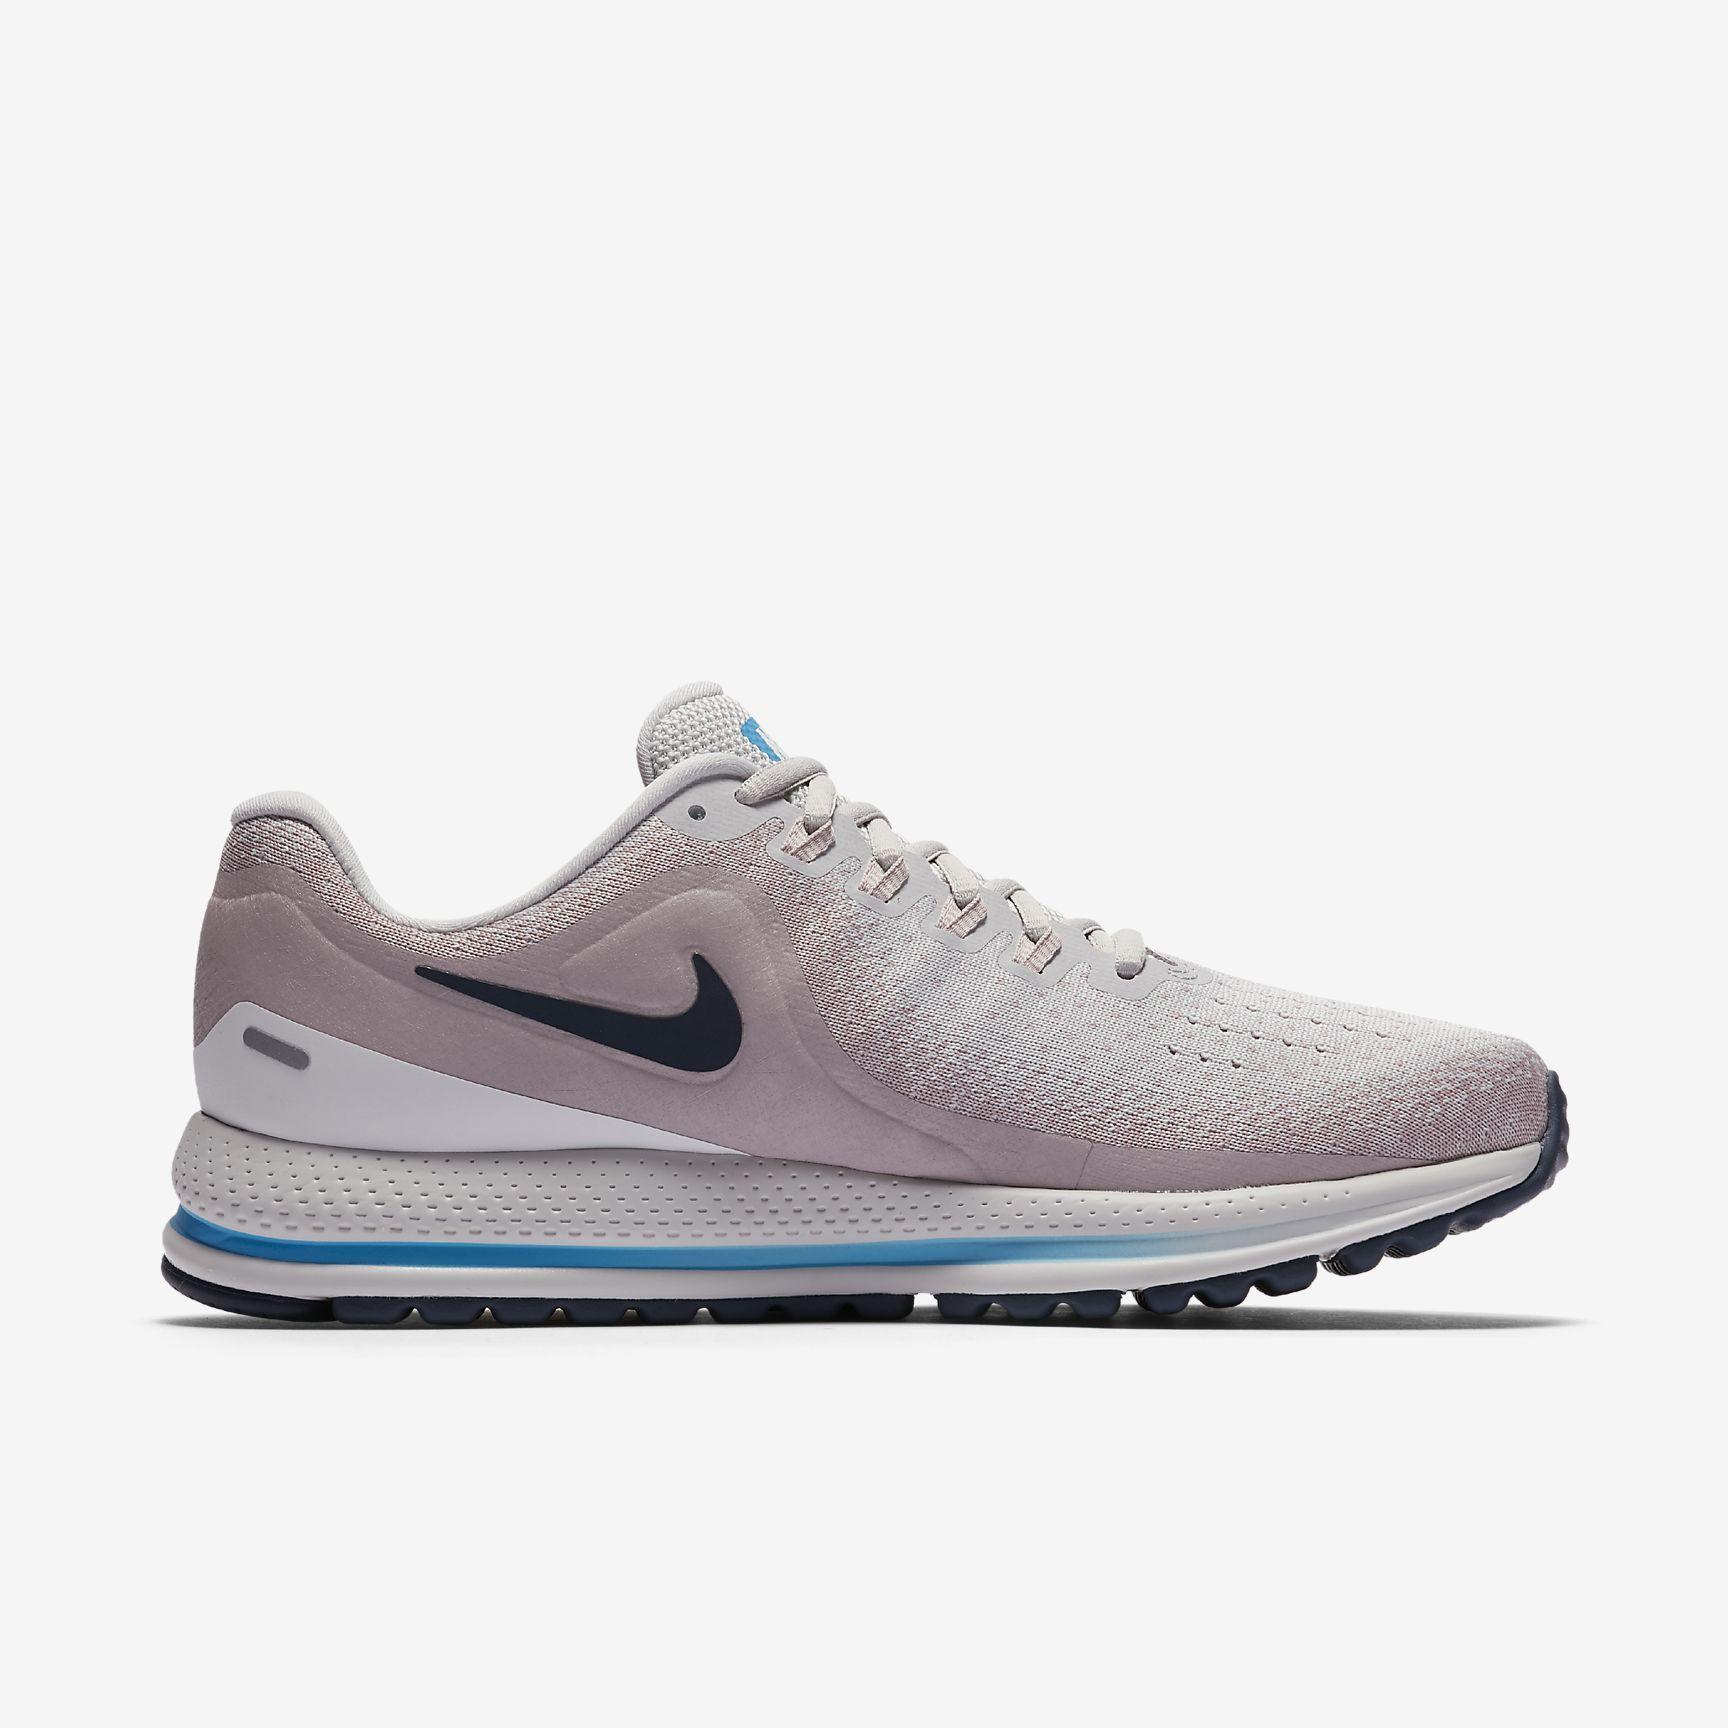 Nike Lady Air Zoom Vomero 13 in Weiß